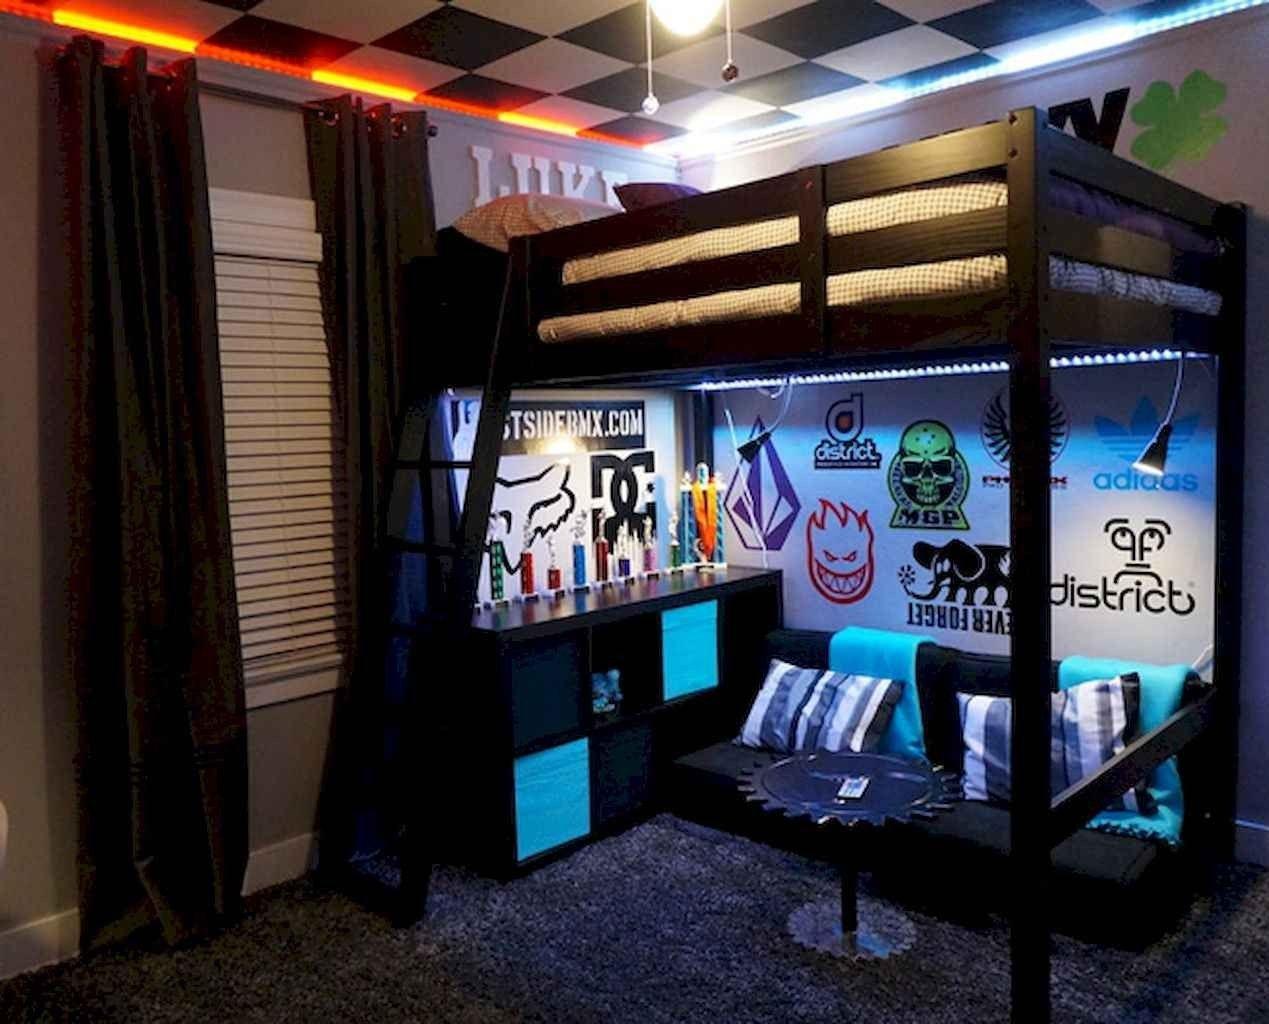 50+ Luxury Kid's Bedroom Design IdeasAffordable Kid's Bedroom Design Ideas